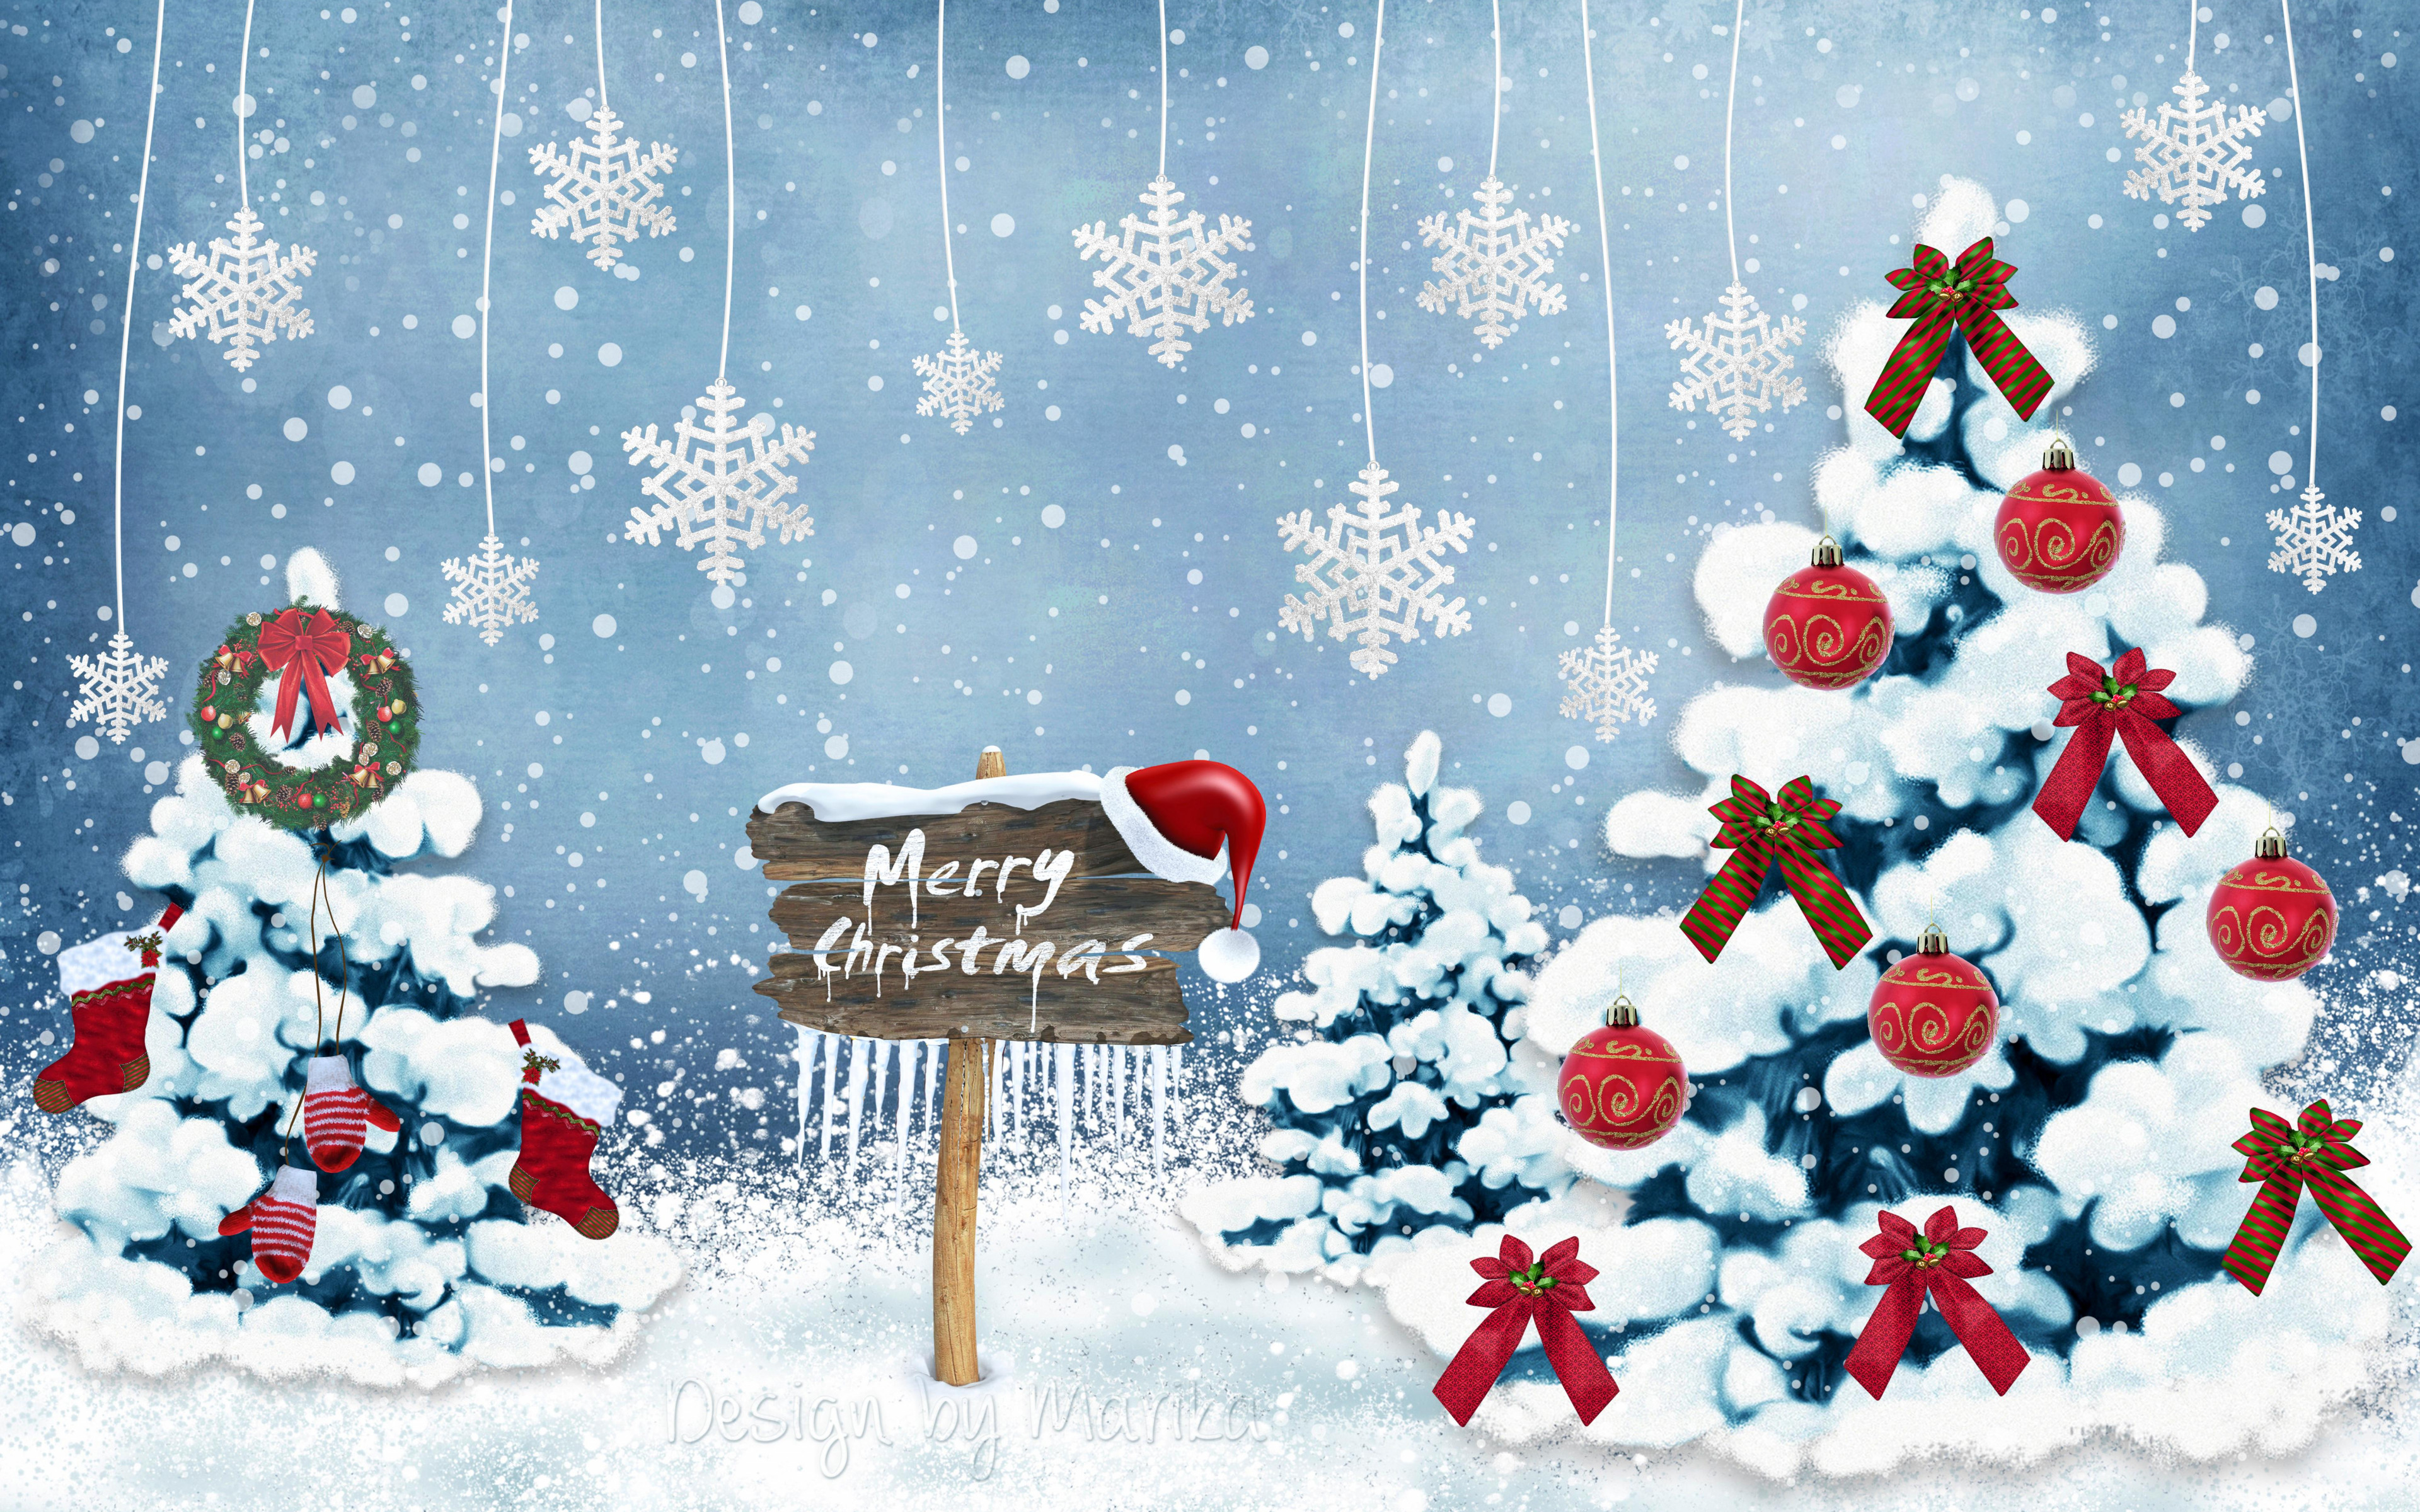 Merry Christmas Card 4k Wallpaper 3840x2400